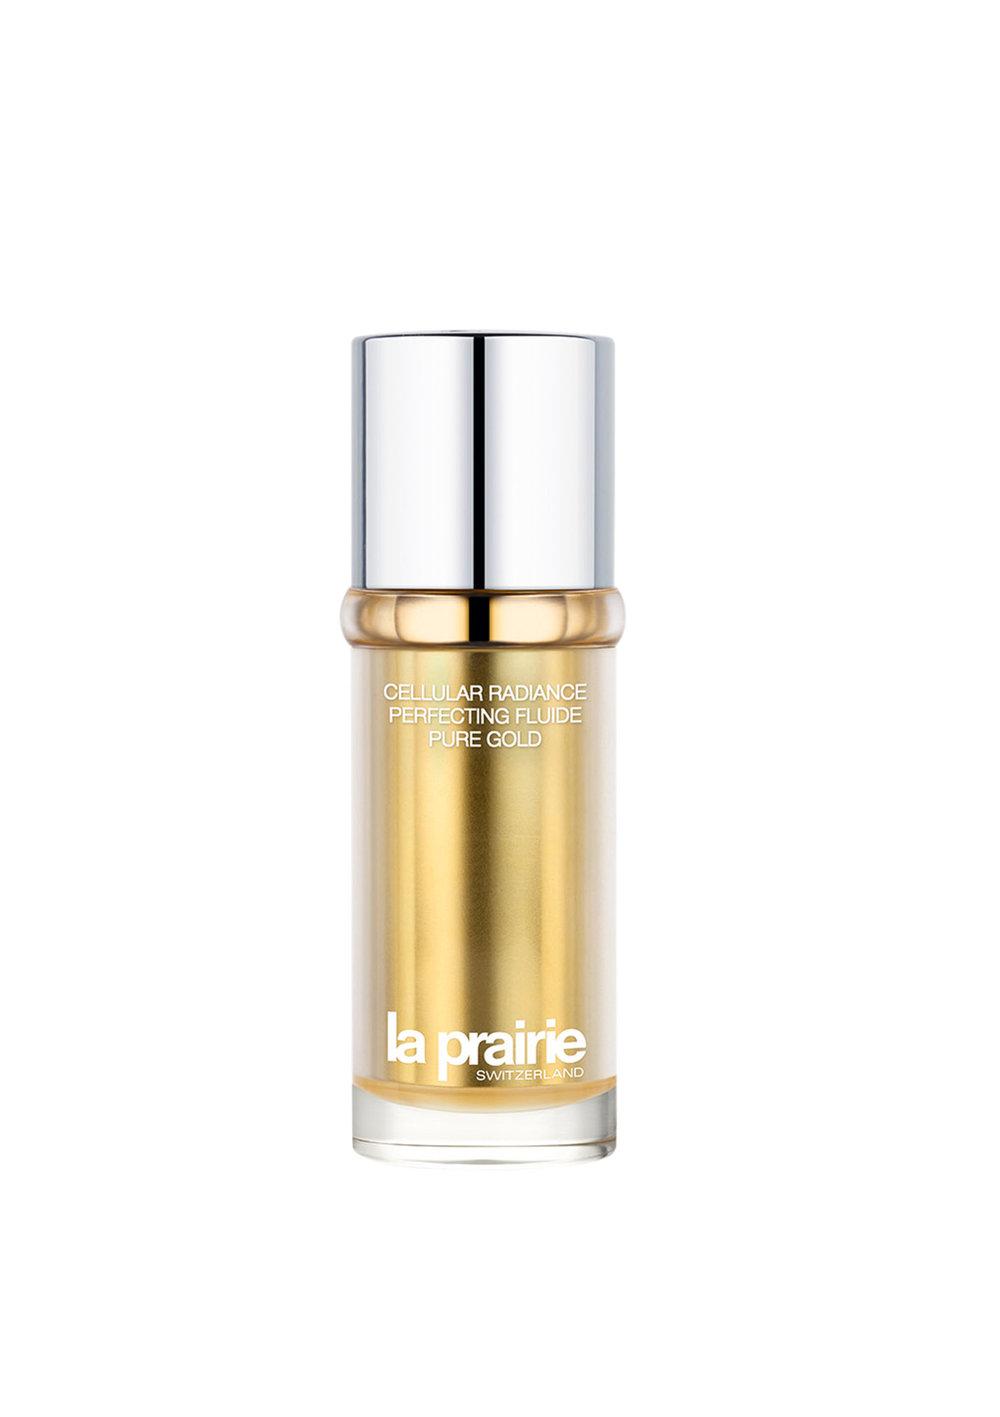 All that Glitters  The Cellular Radiance Perfecting Fluide Pure Gold by La Prairie $670  在流動液體中加入純金顆粒,以複雜的光反射技術讓皮膚光彩照人。真正的魔法其實在能夠促進肌膚再生、減少皺紋、平衡膚色的秘密配方中。用於早晚潔面、精華液之後,以指尖在臉上輕輕塗勻。